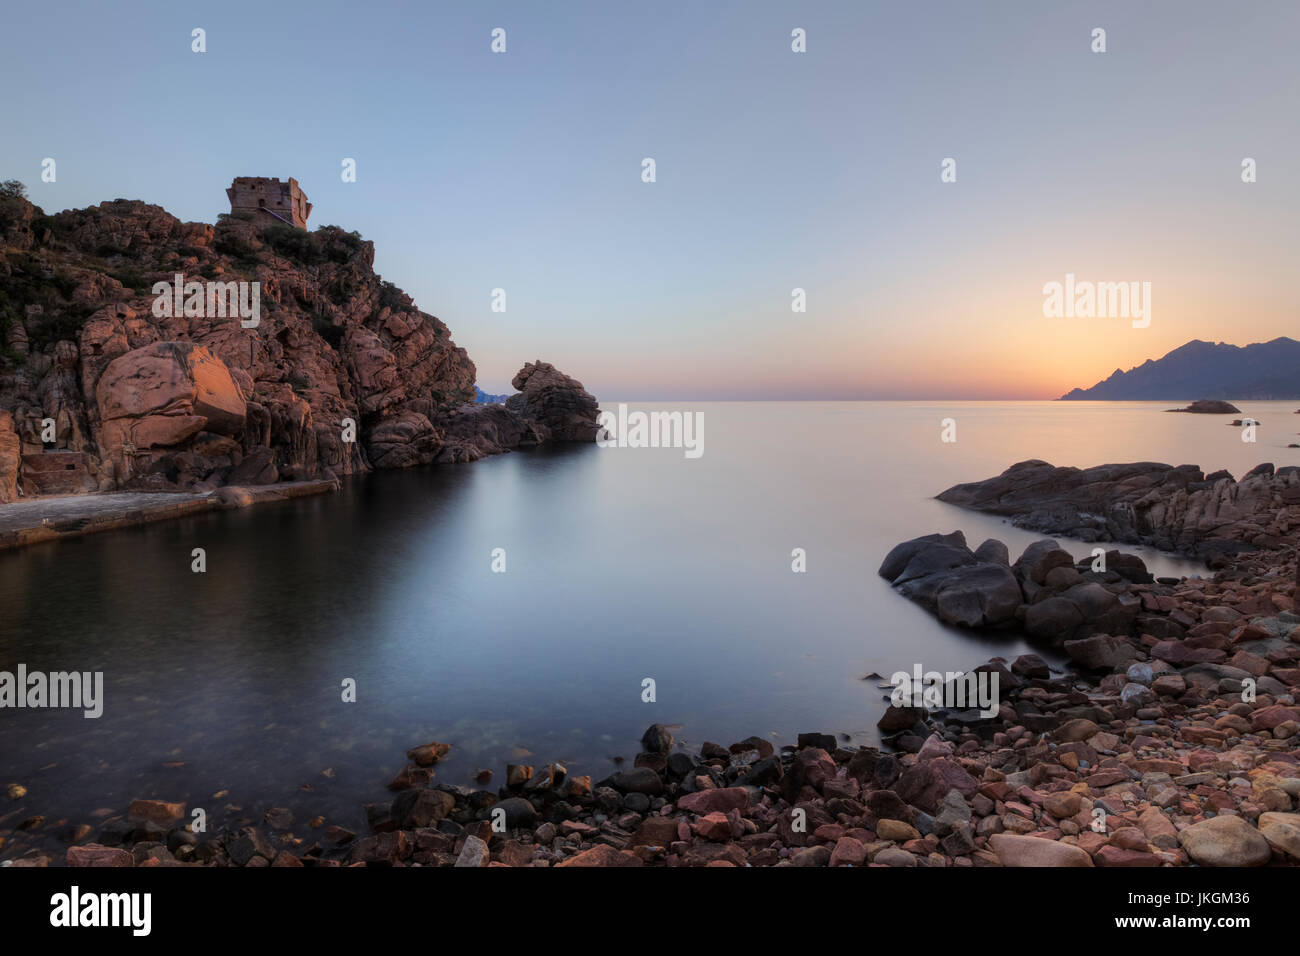 Porto, Ota, Corsica, France - Stock Image